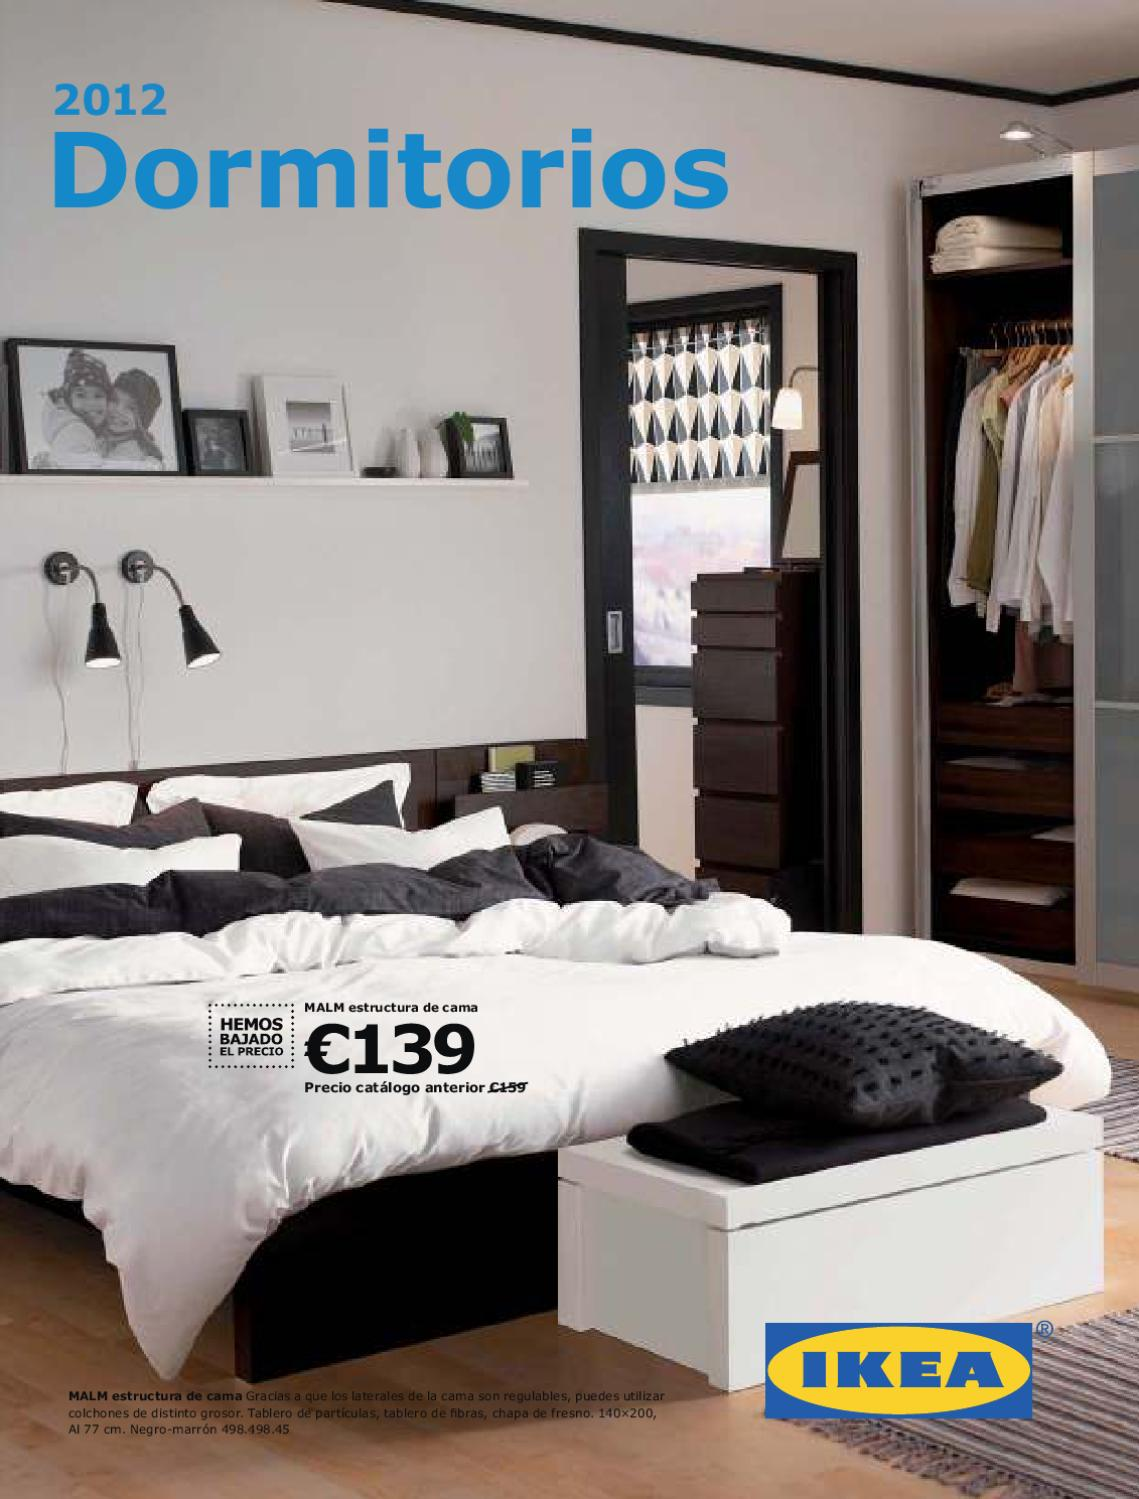 Ikea catálogo dormitorios 2014 by SuperCatalogos.es - issuu